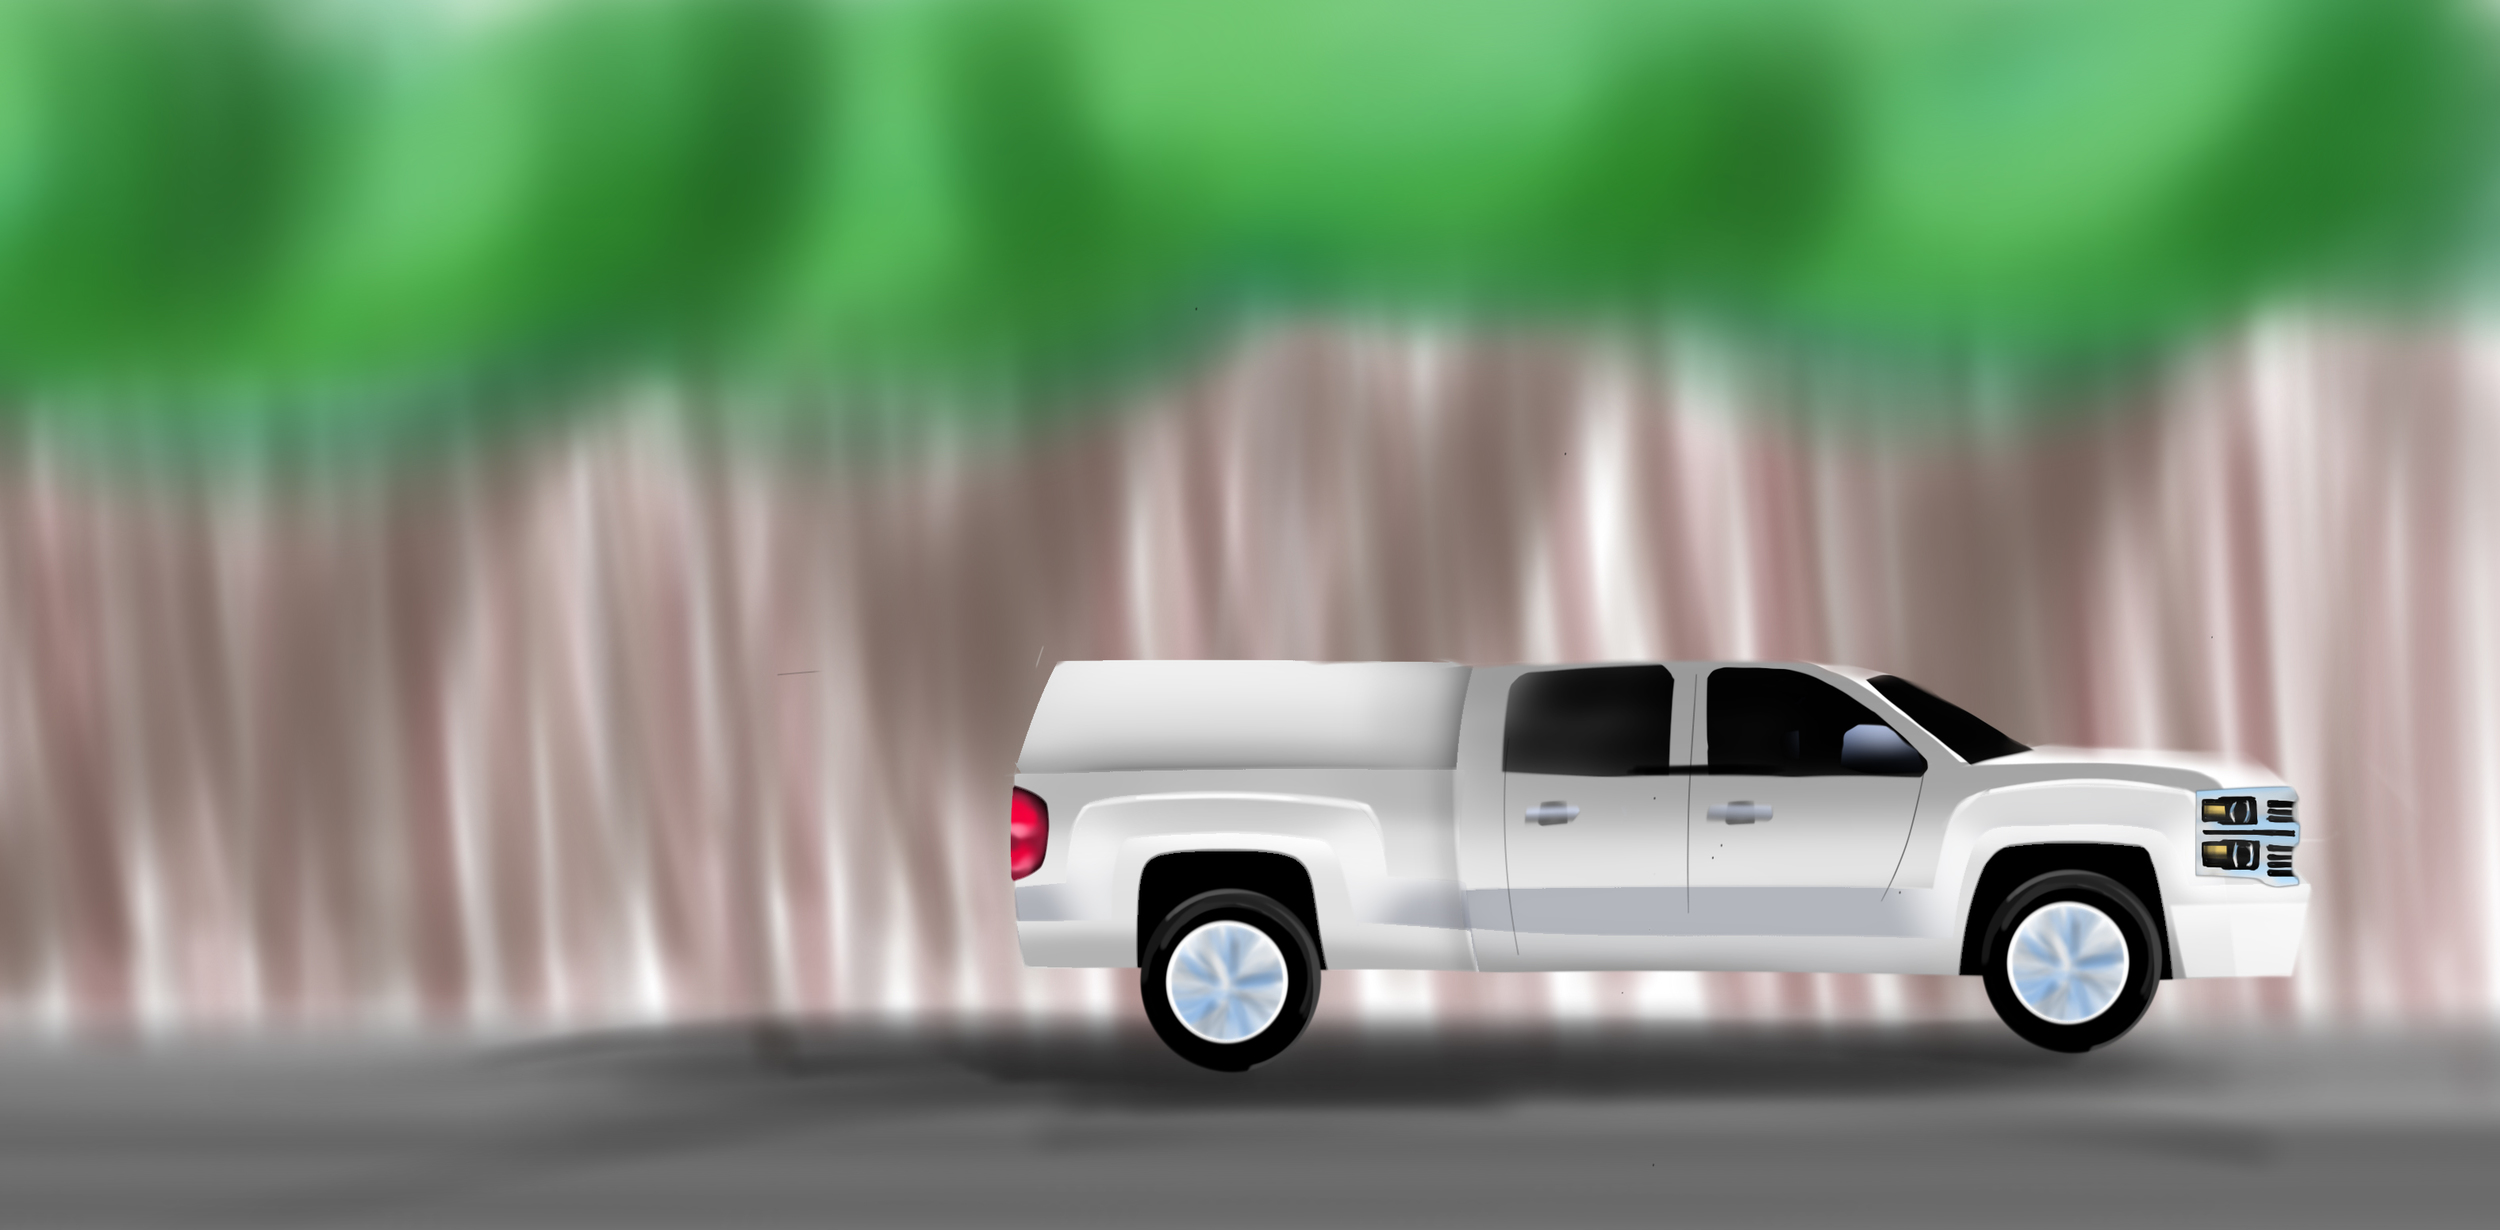 omnrf2- driving.jpg